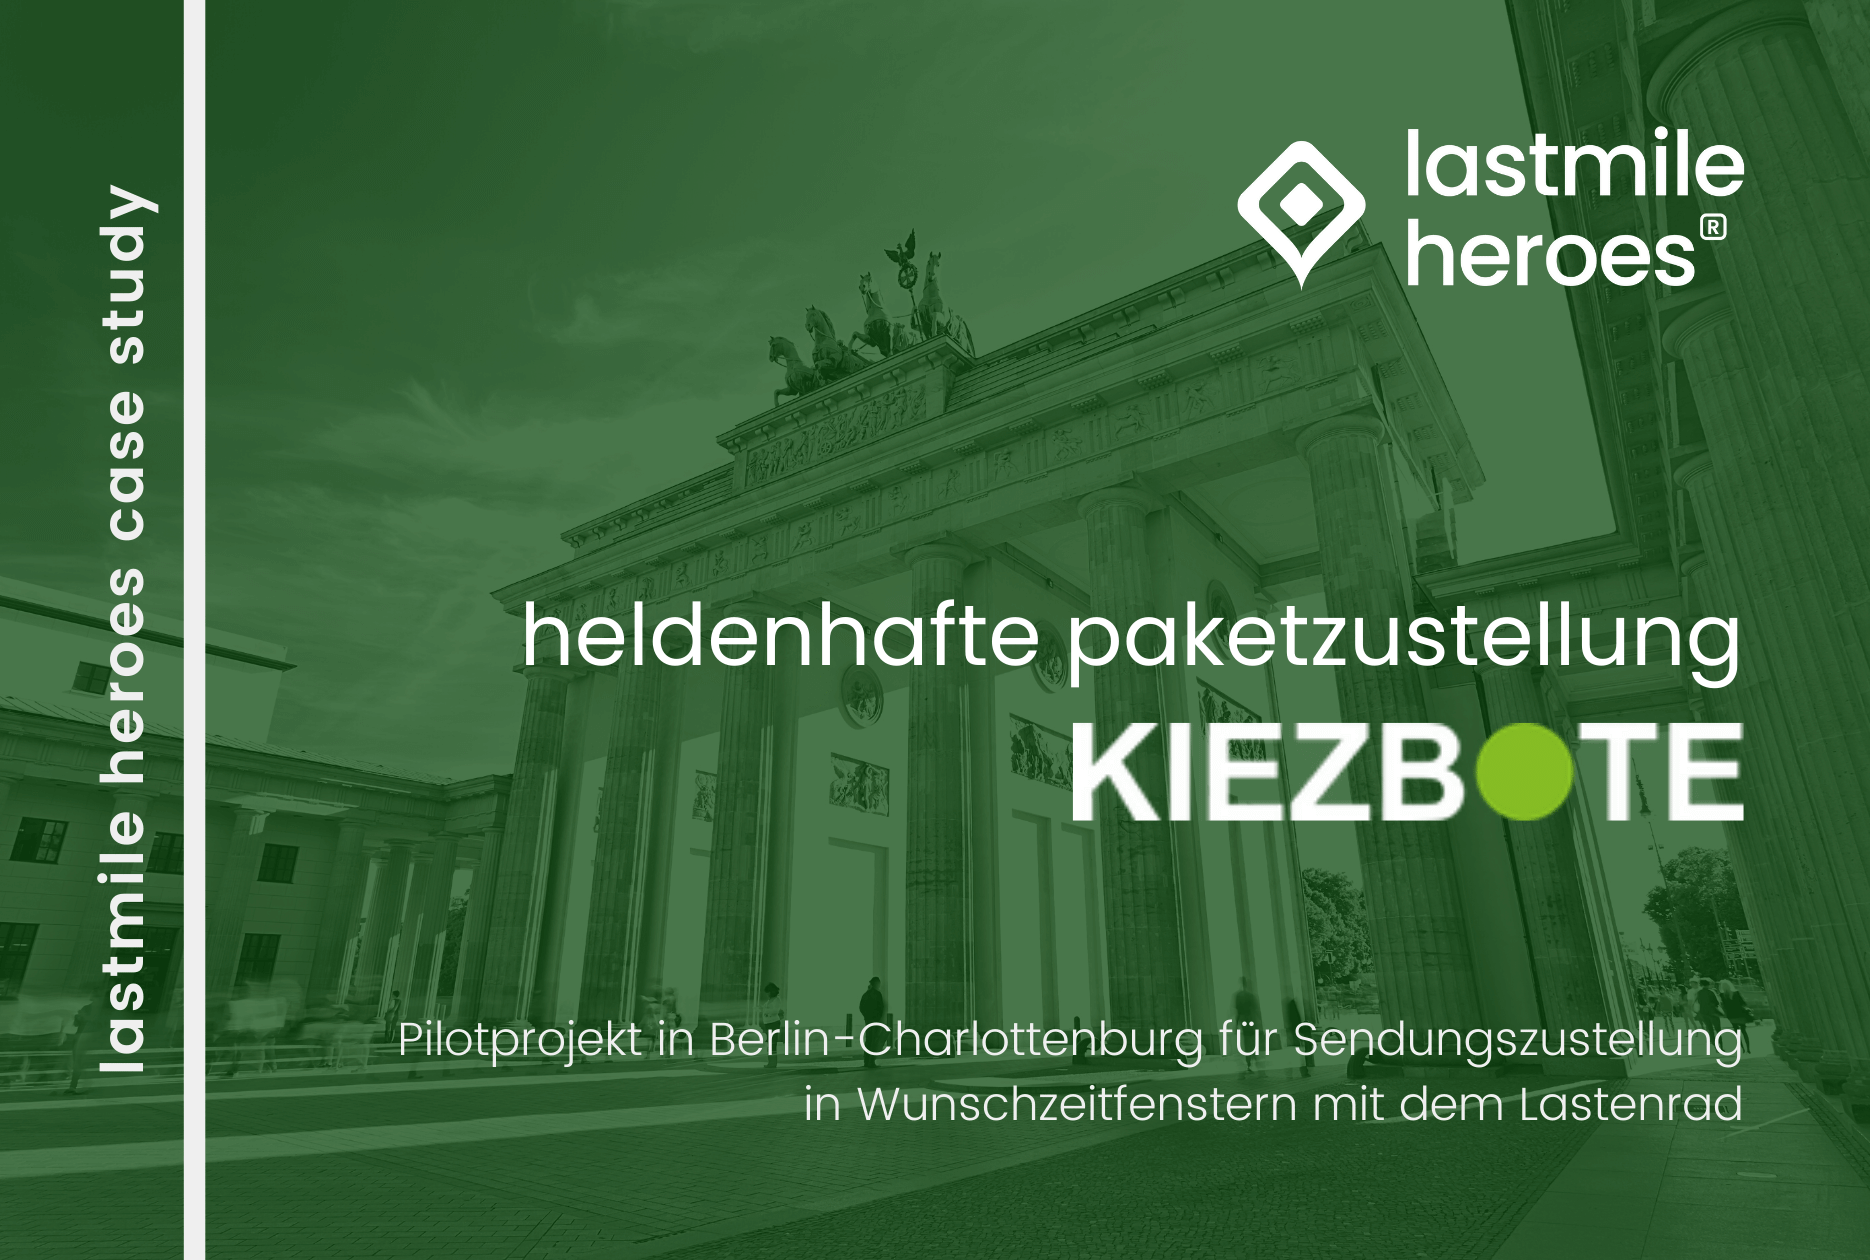 case study kiezbote - blog